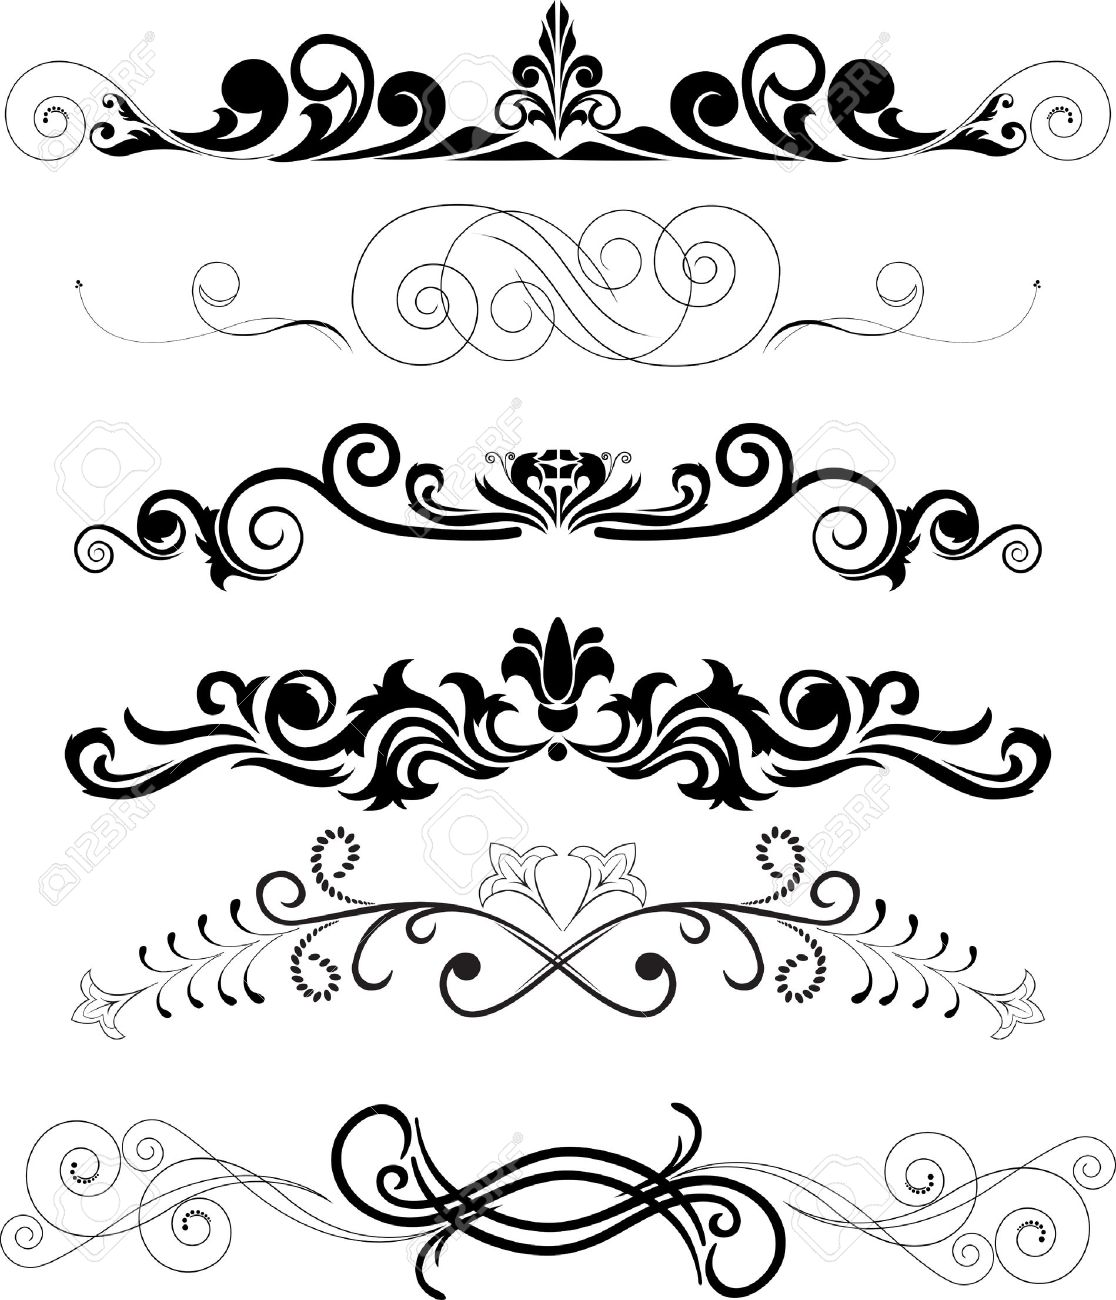 Illustration Set Of Swirling Decorative Floral Elements Royalty